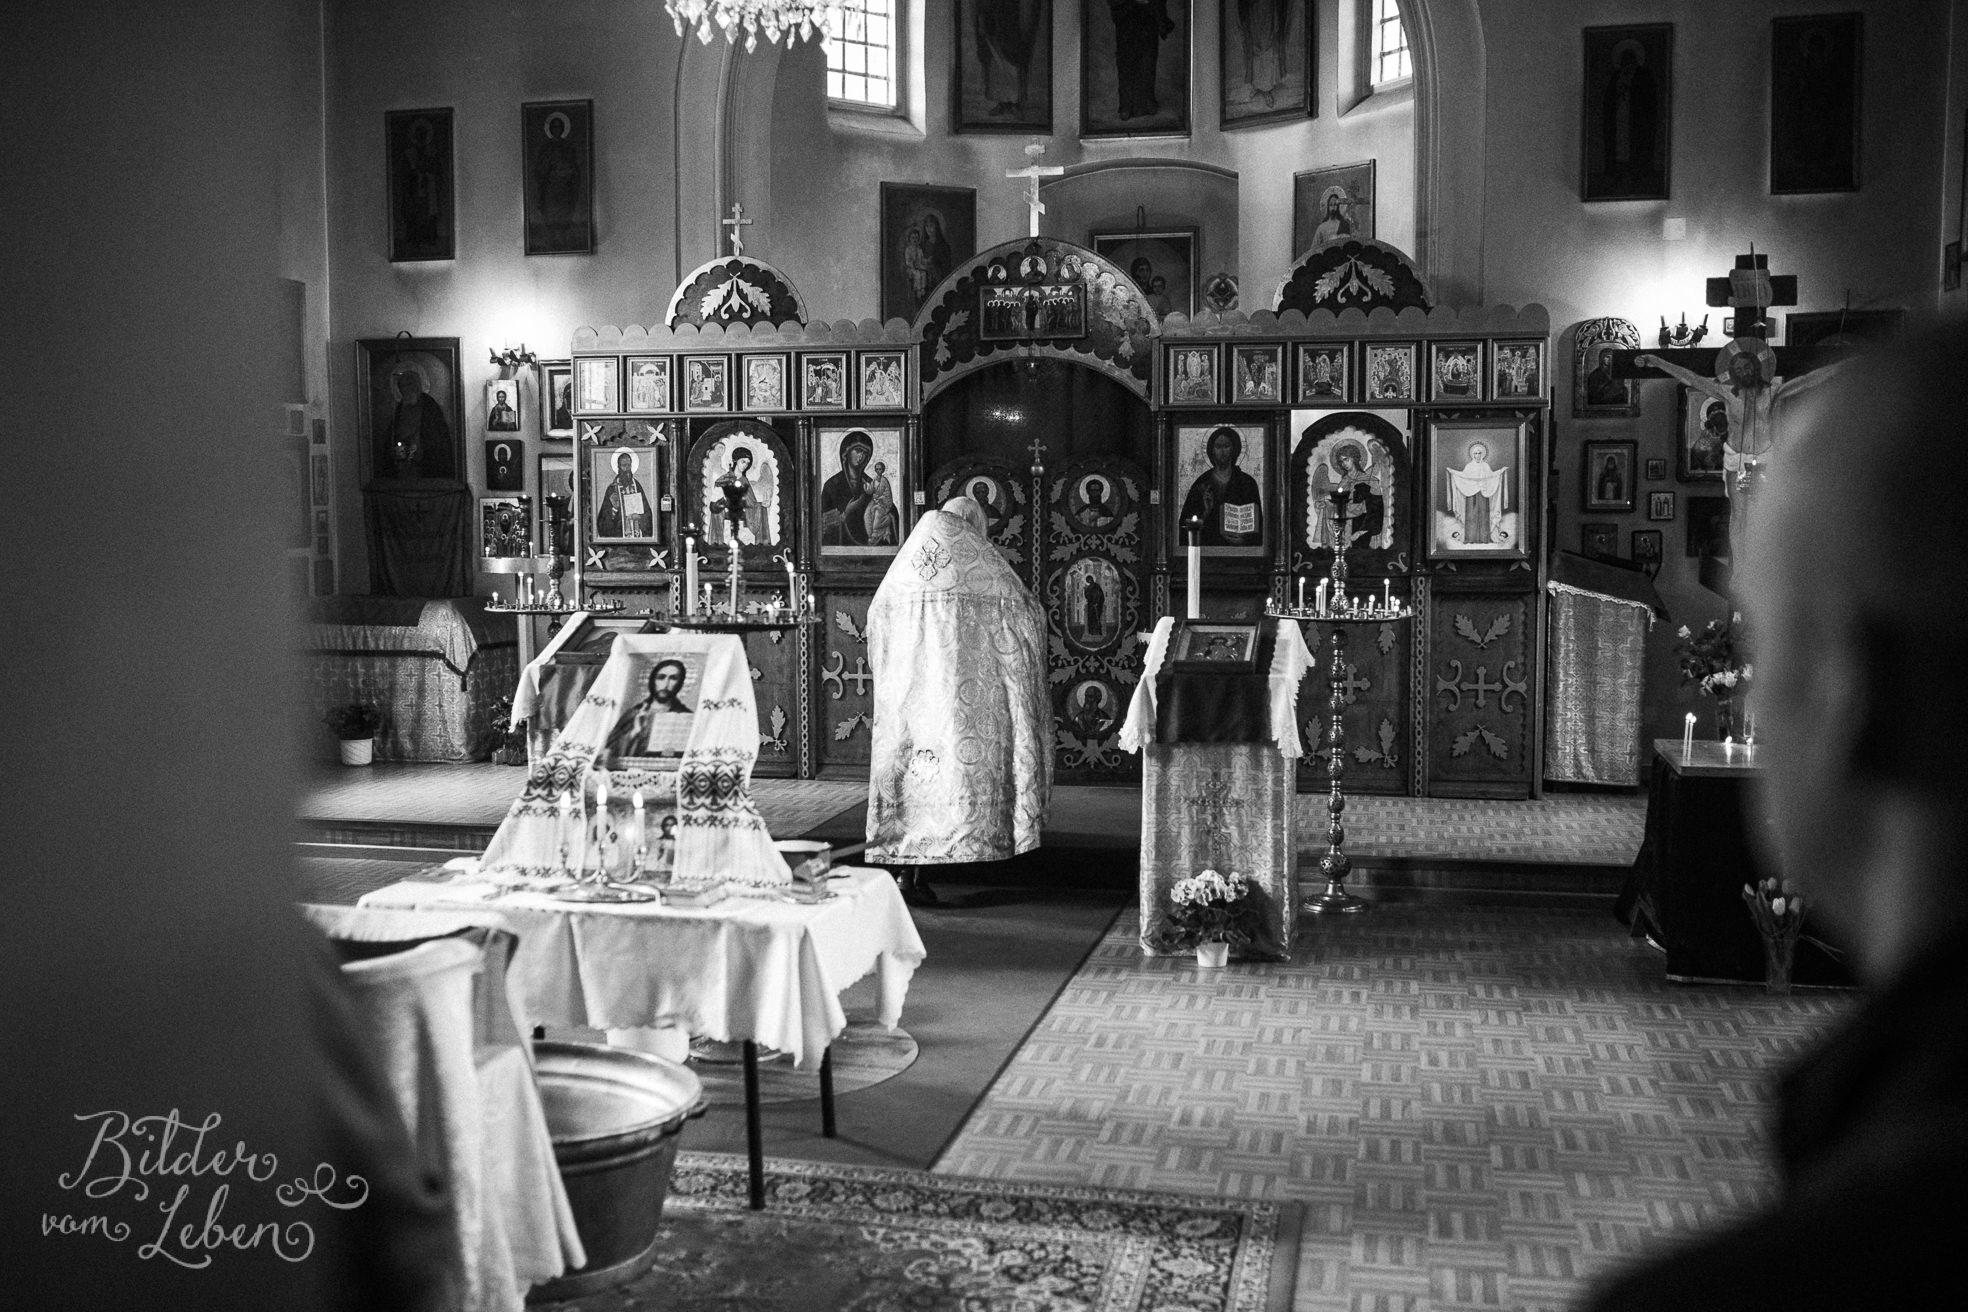 8-Russisch-orthodoxe-taufe-regensburg-mila-7J0A0686